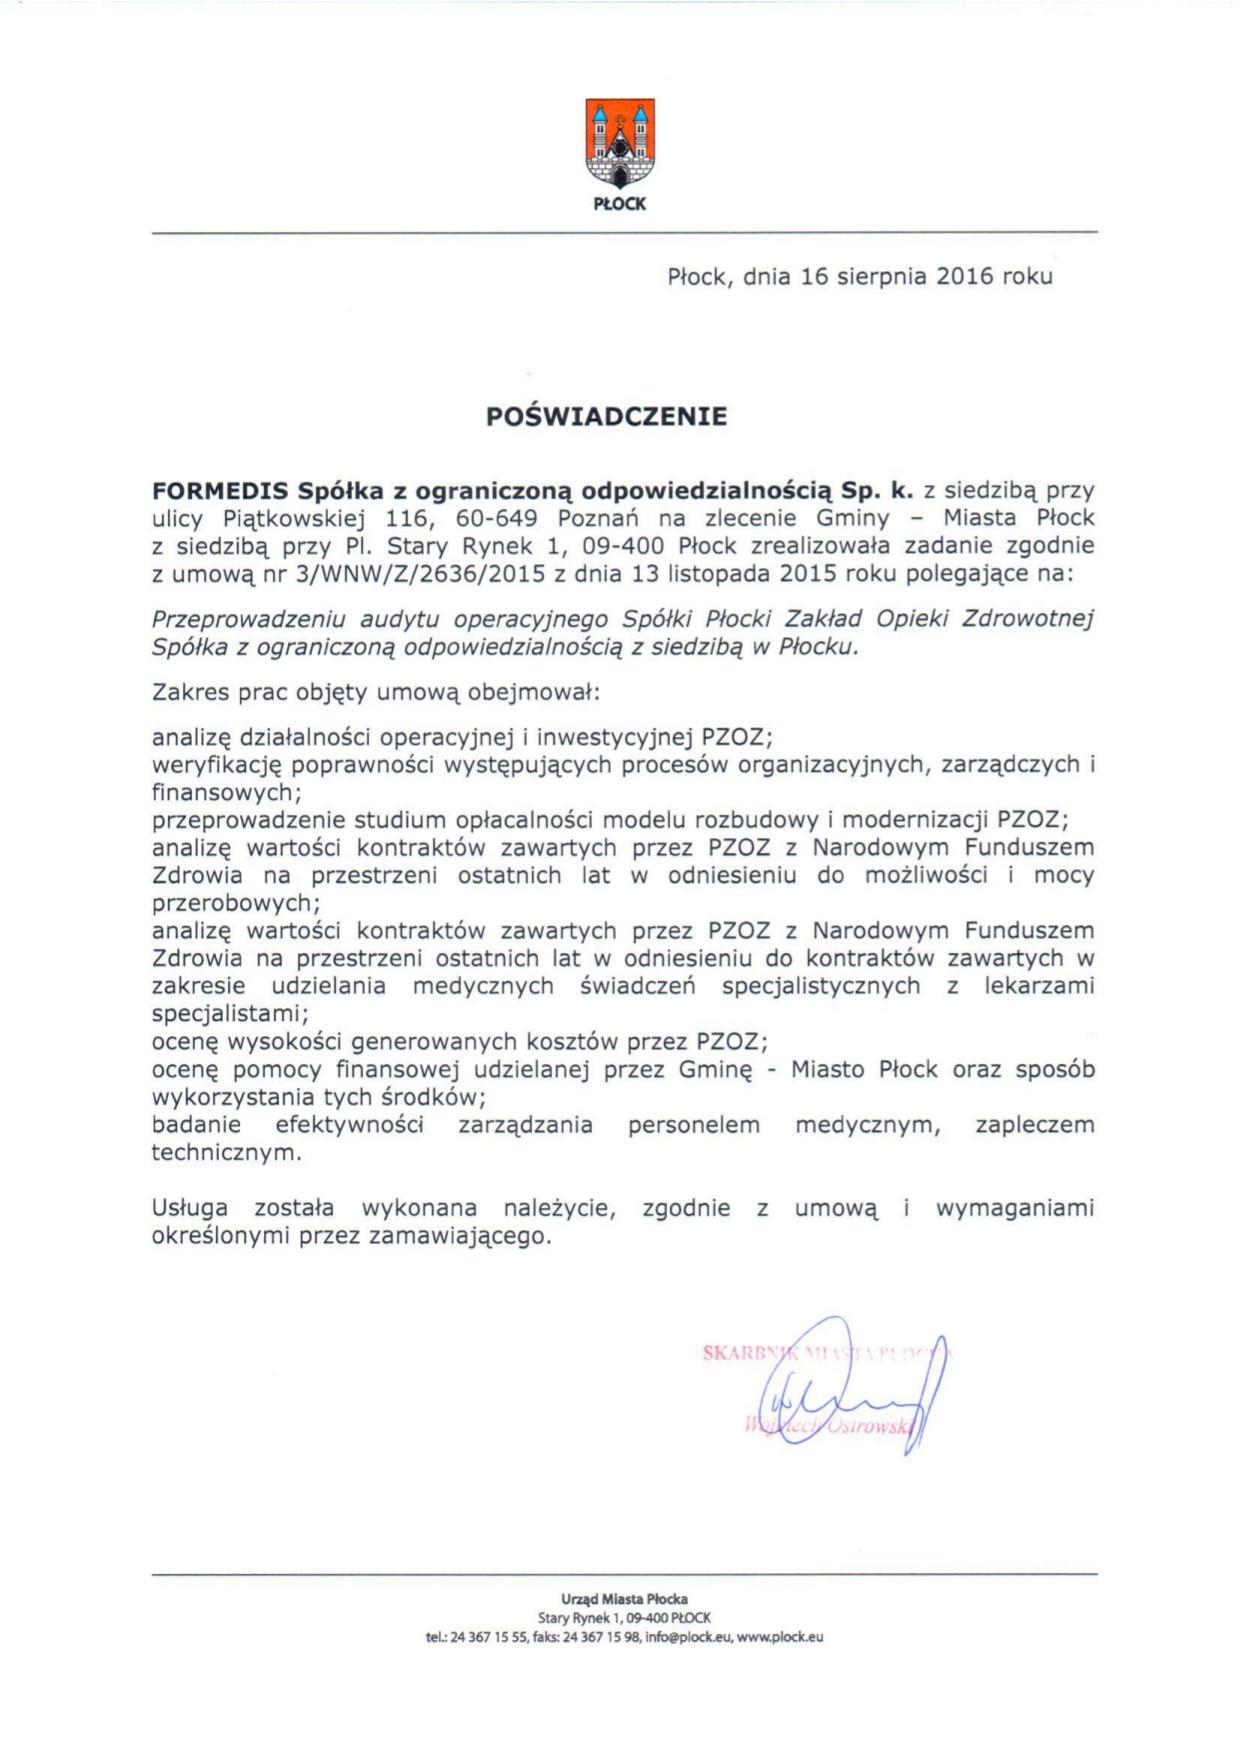 gmina_miasto_plock_referencje